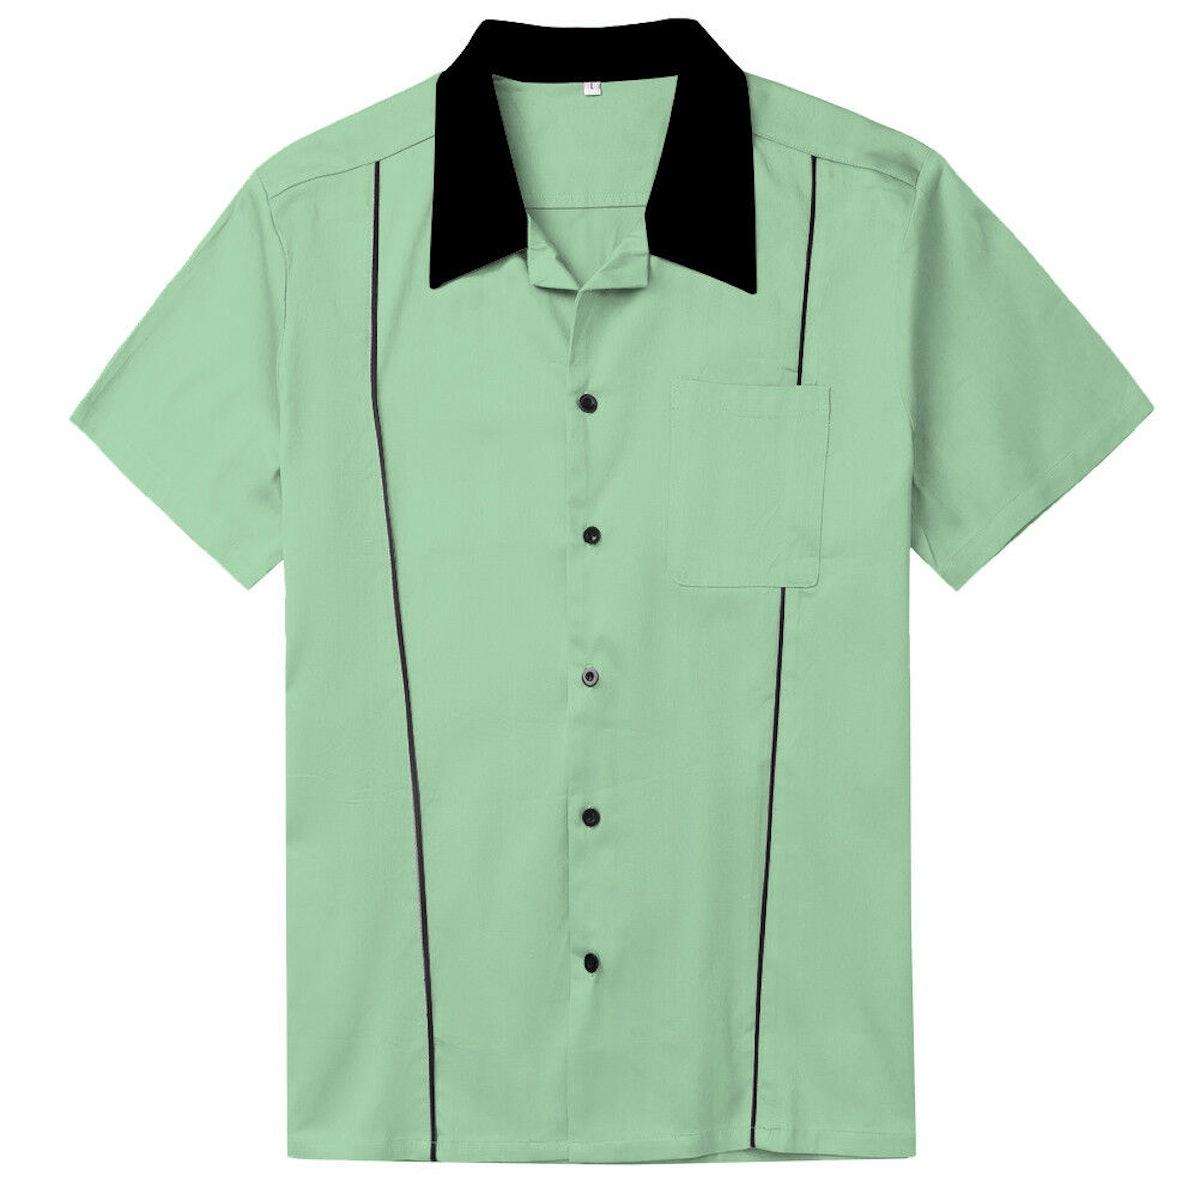 Mens Shirts Plus Size Clothing Rockabilly Retro Bowling Shirts Mint Green